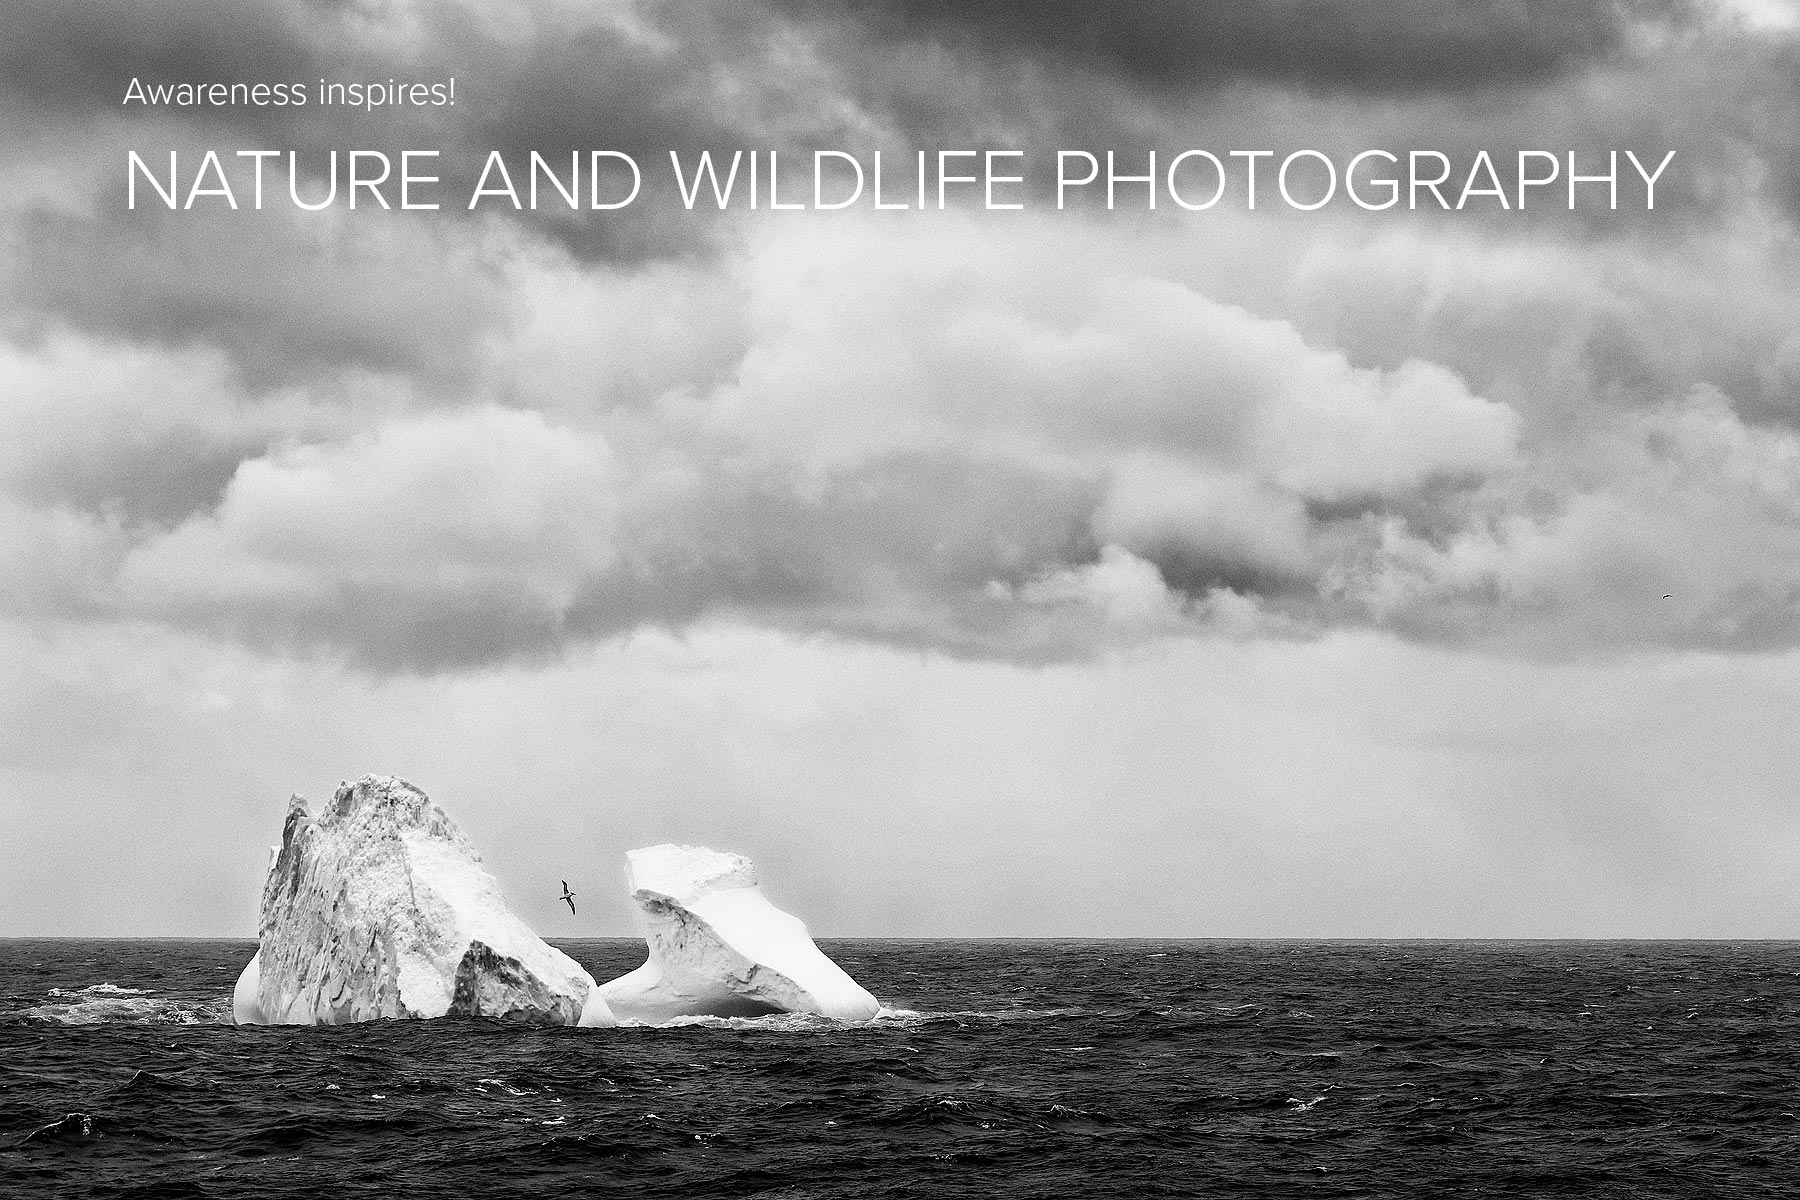 Iceberg-with-Grey-headed-albatross-flying-2_B&W_S6A1005-Bird-Island,-South-Georgia-Islands,-Southern-ocean.jpg